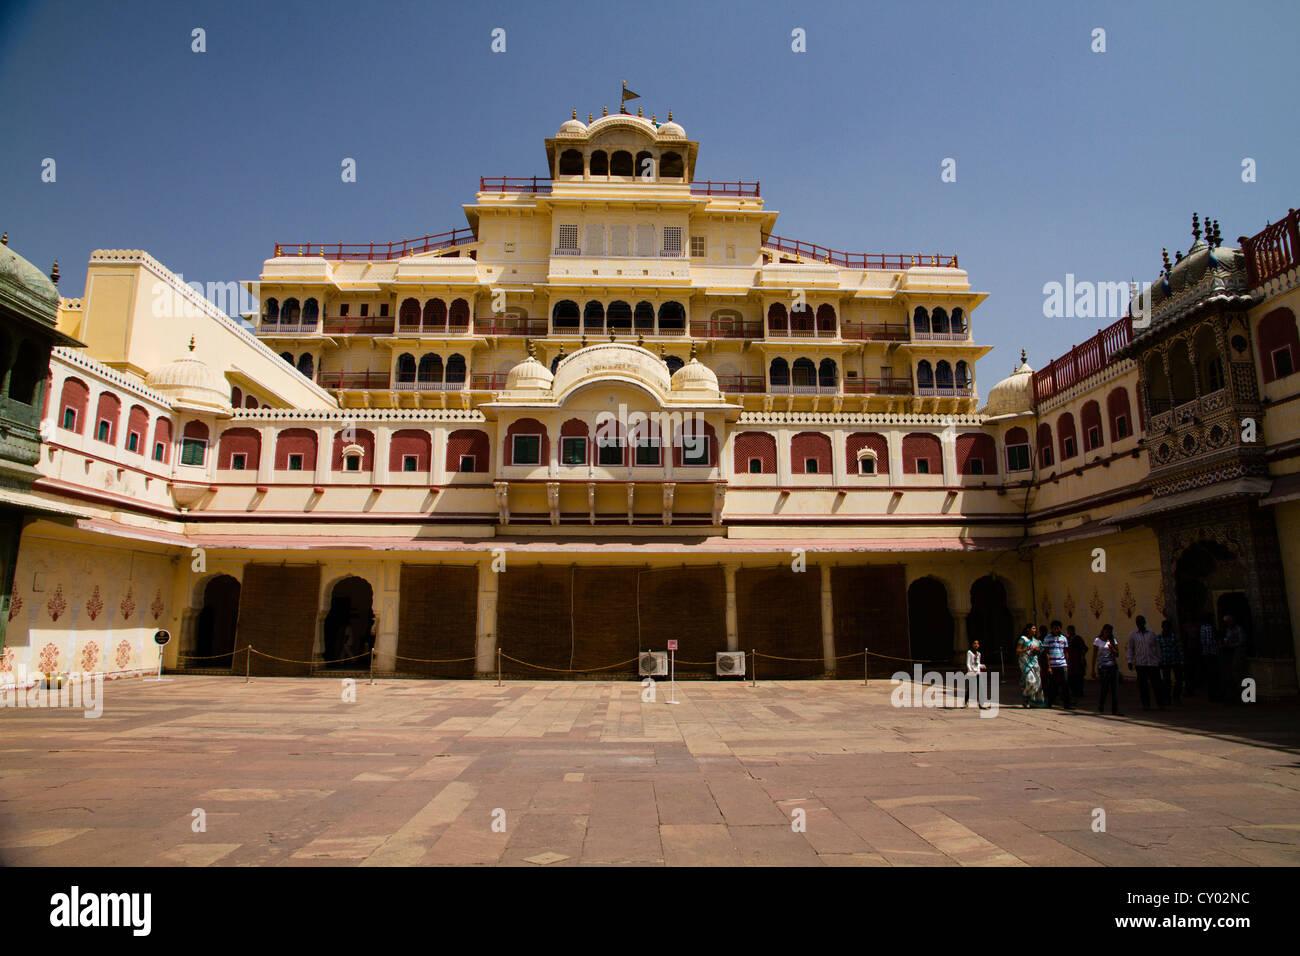 Chandra Mahal, City Palace, Jaipur, the Pink City, Rajasthan, India, Asia Stock Photo